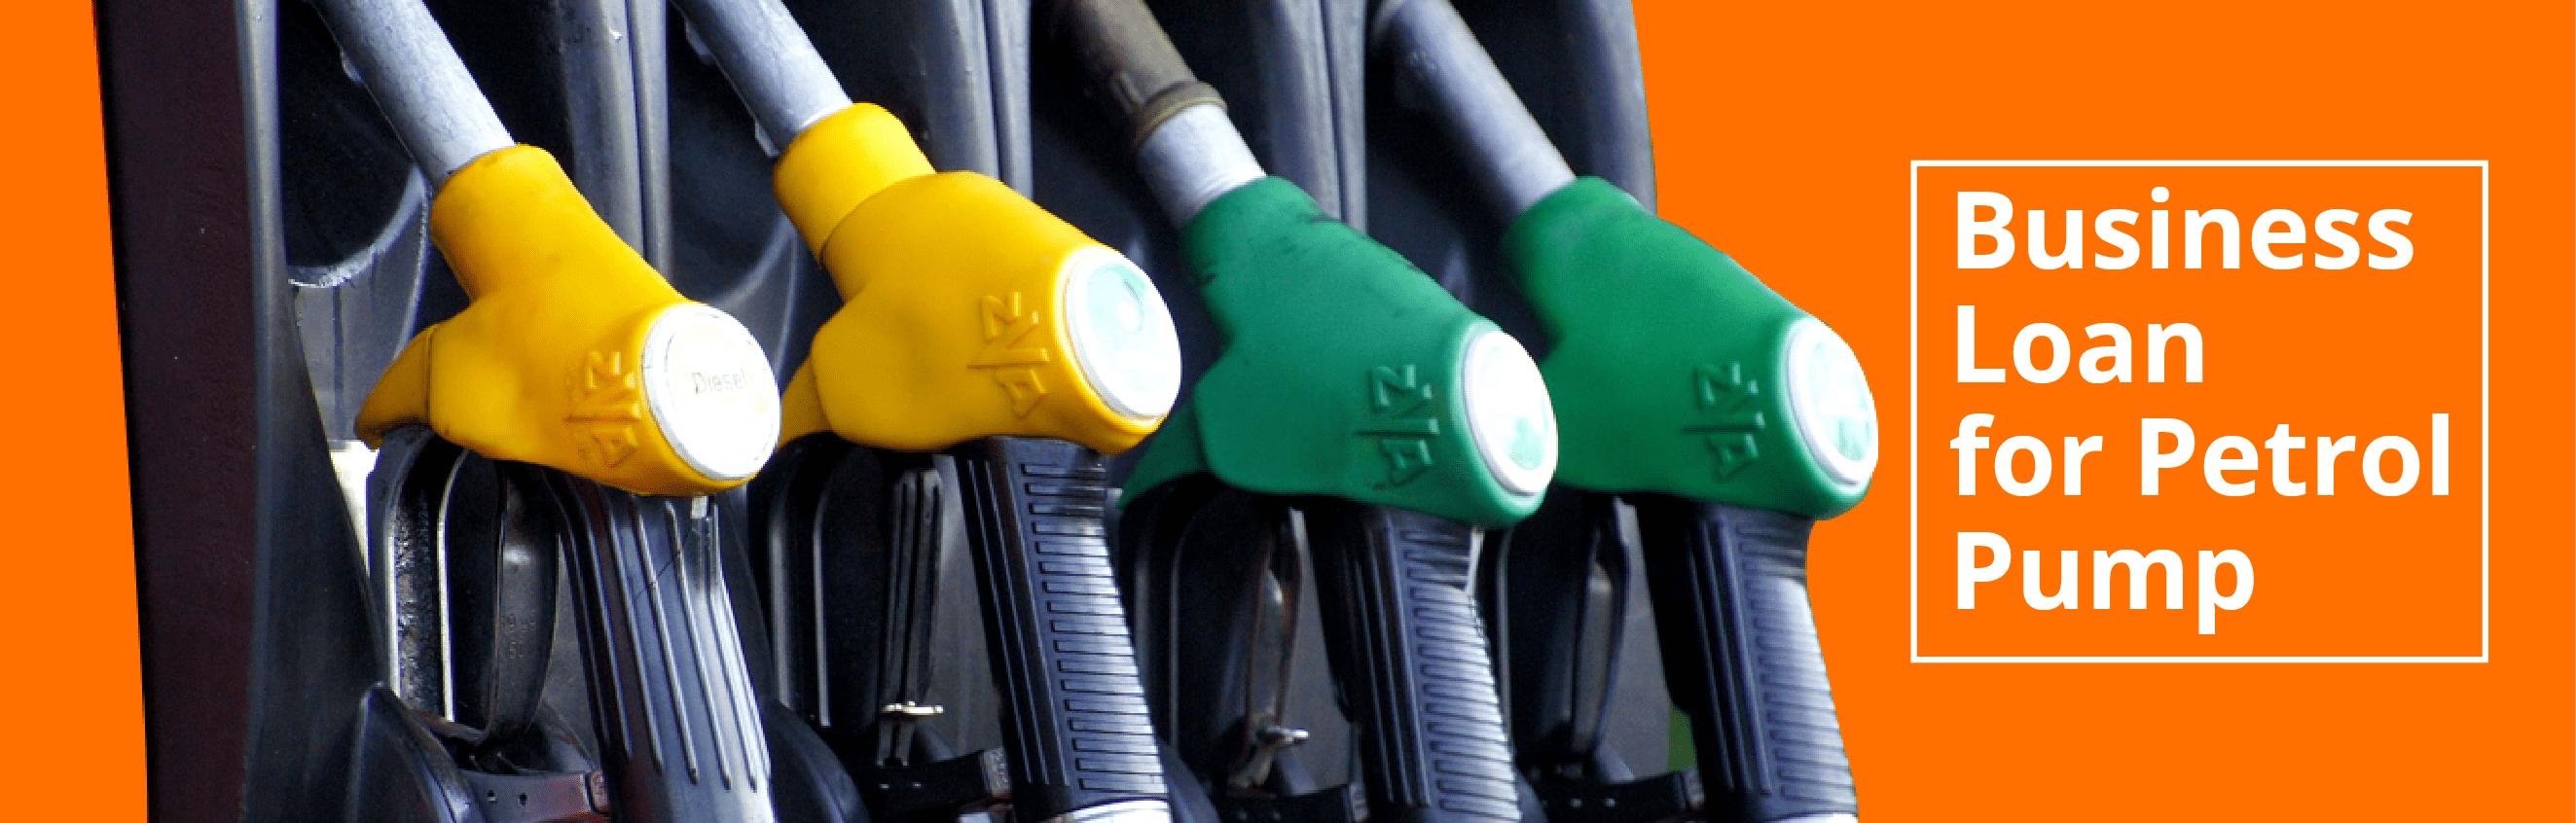 business loan for petrol oump